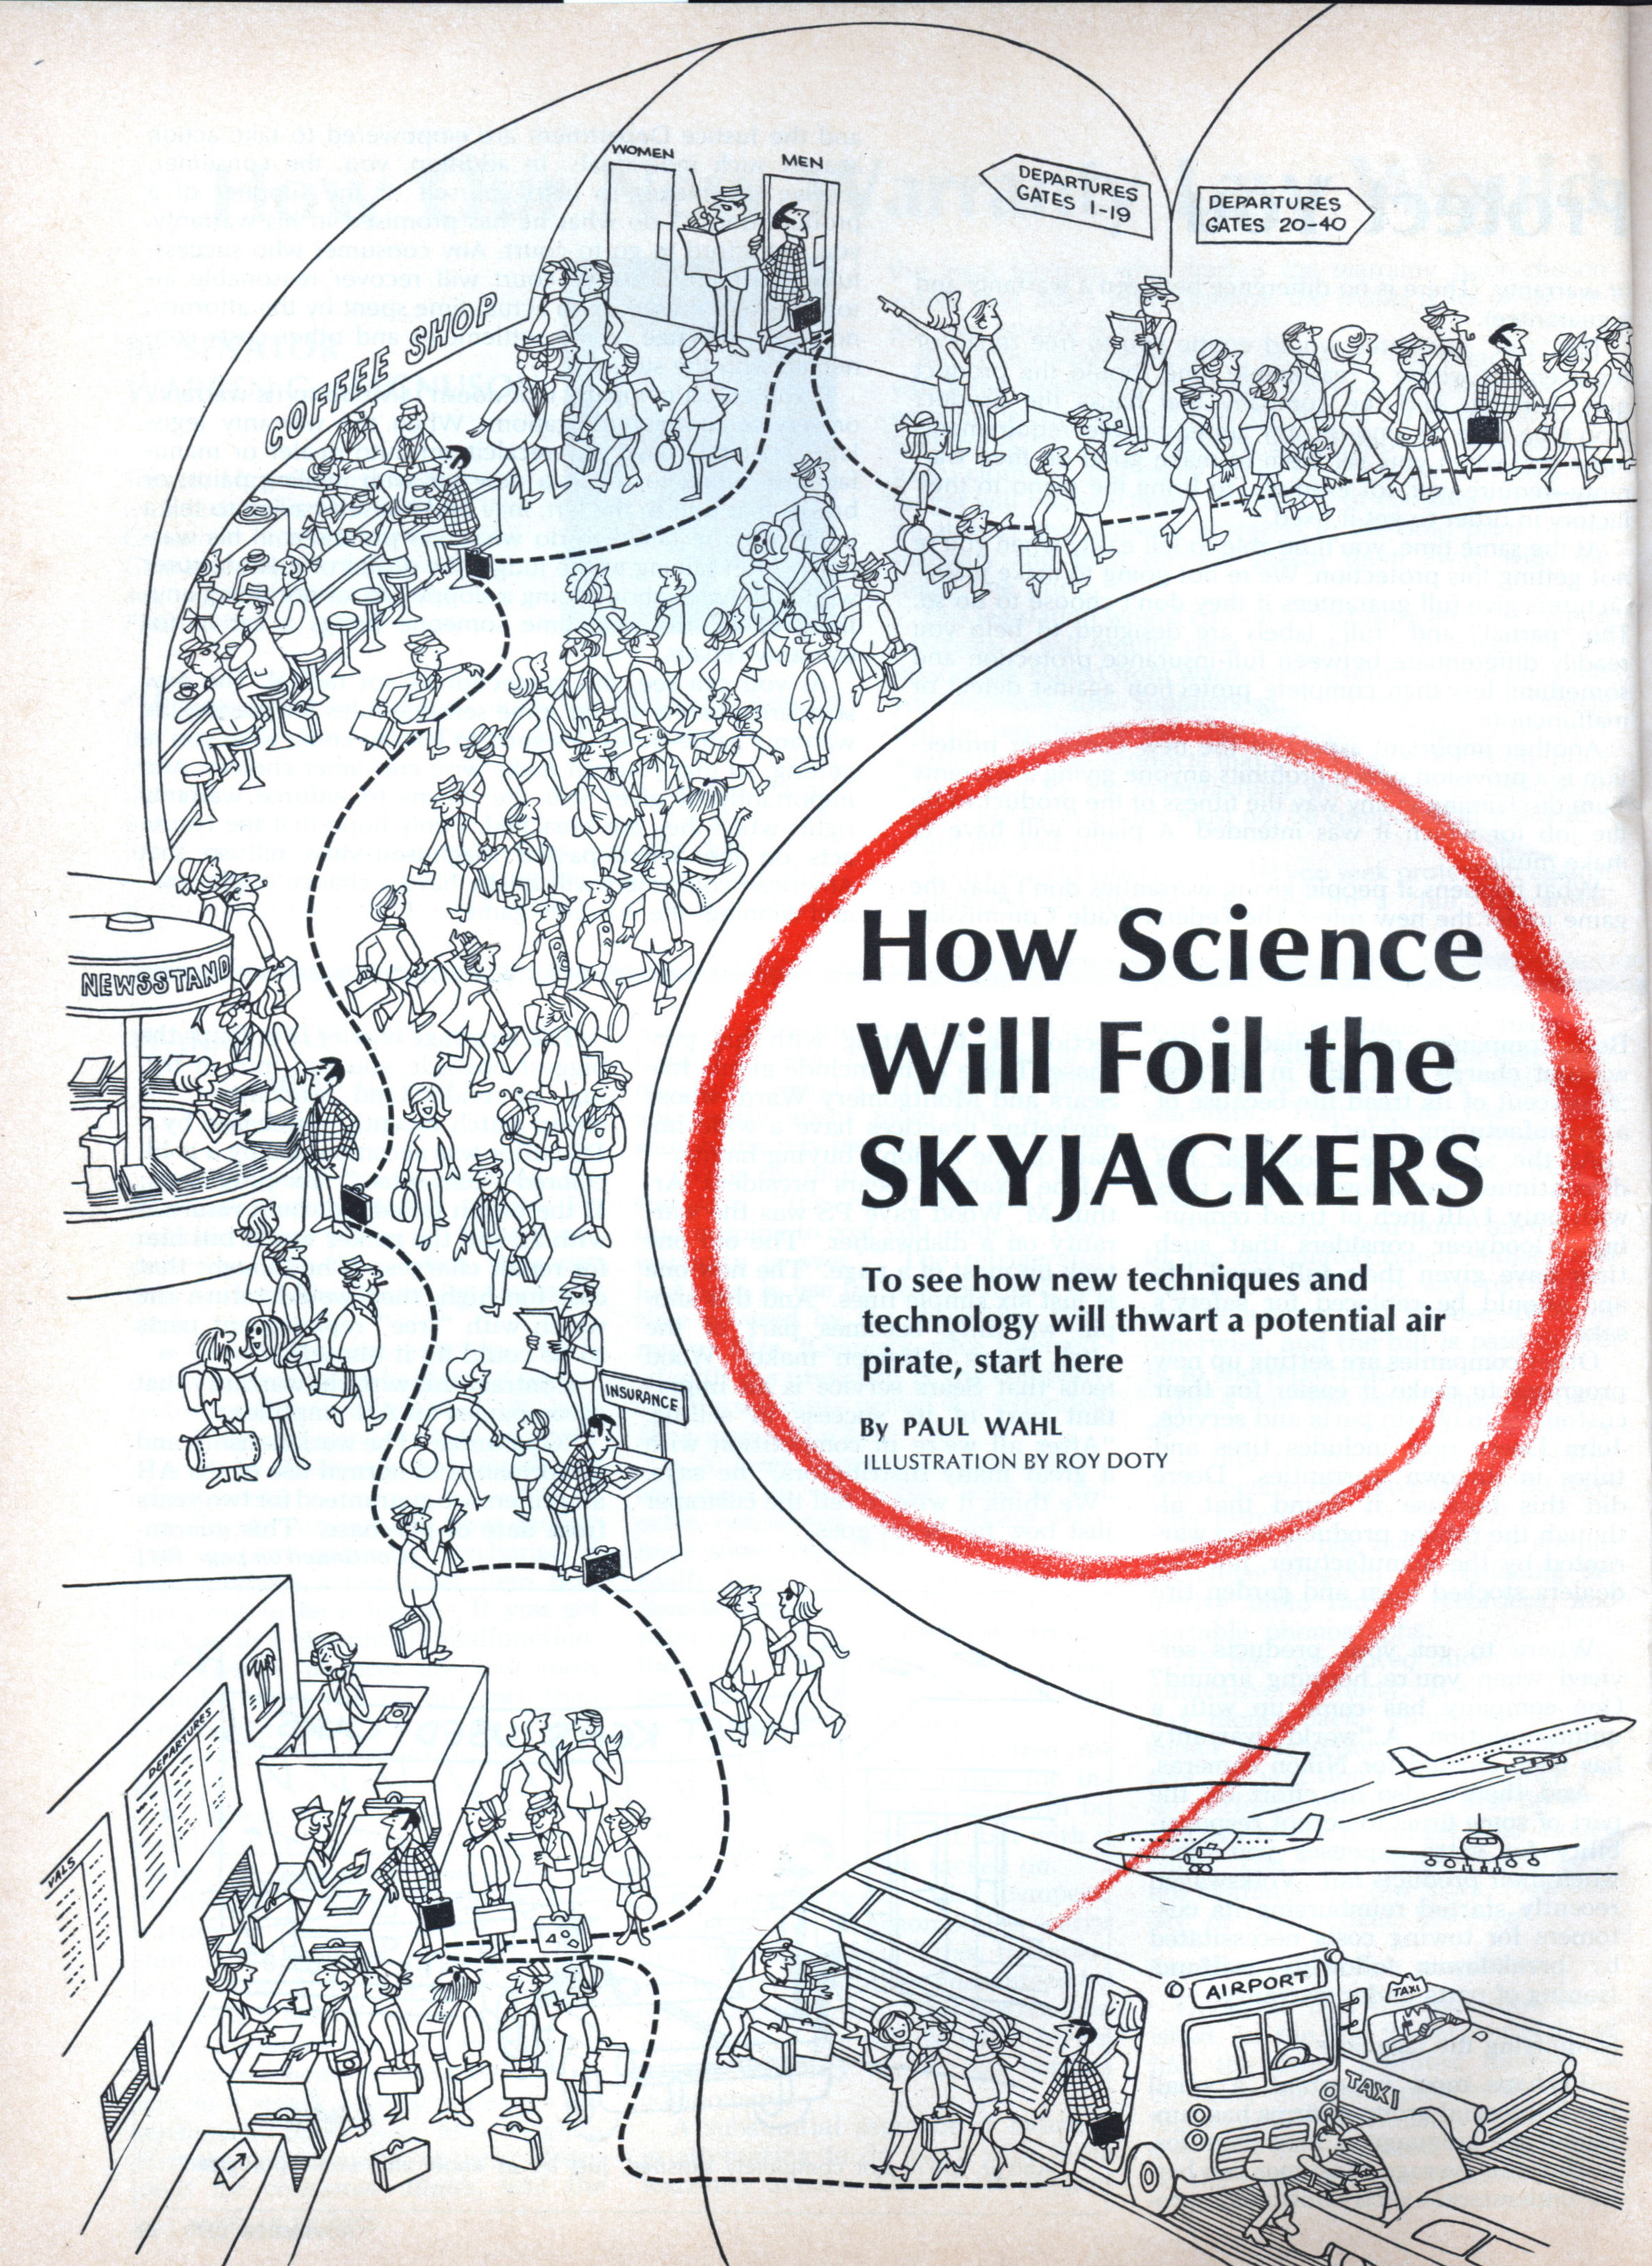 http://blog.modernmechanix.com/mags/PopularScience/11-1970/skyjackers/skyjackers_0.jpg